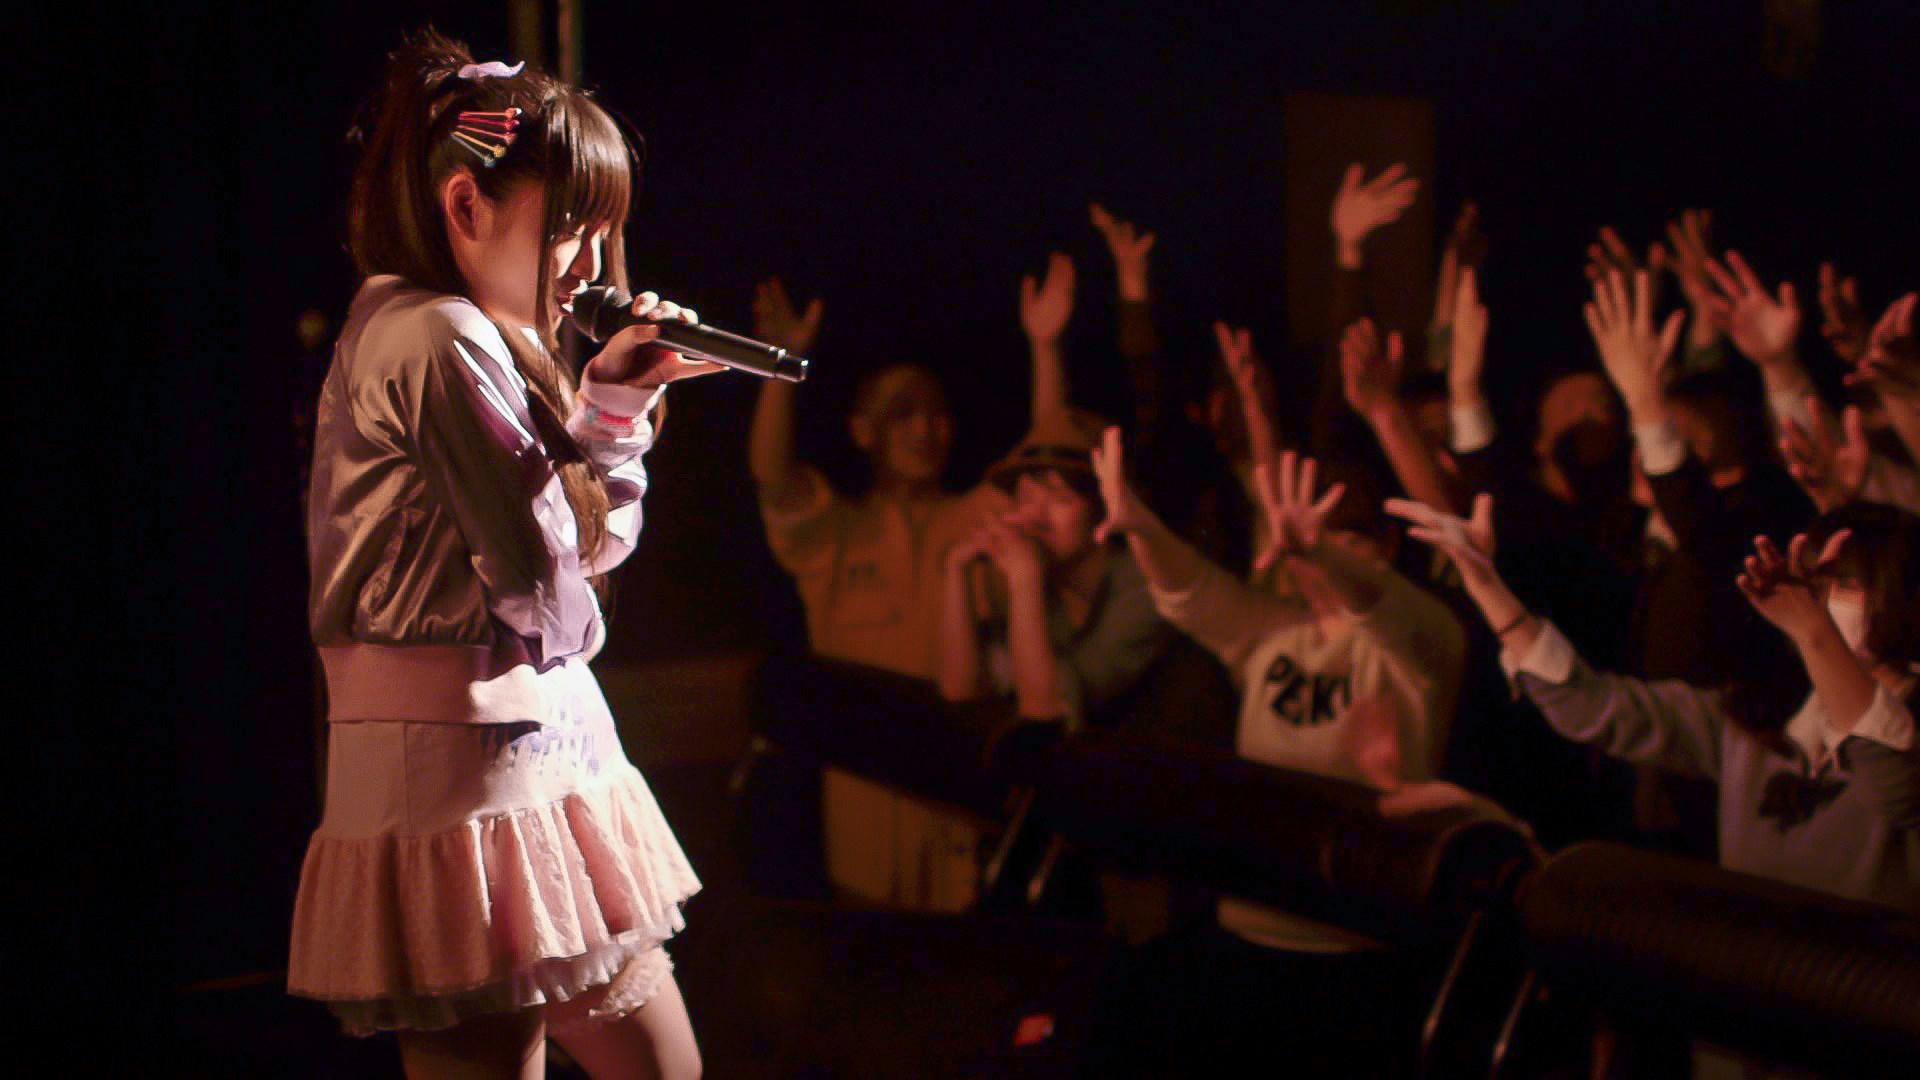 Drama-MAX-Tokyo-Idols-film-review-4